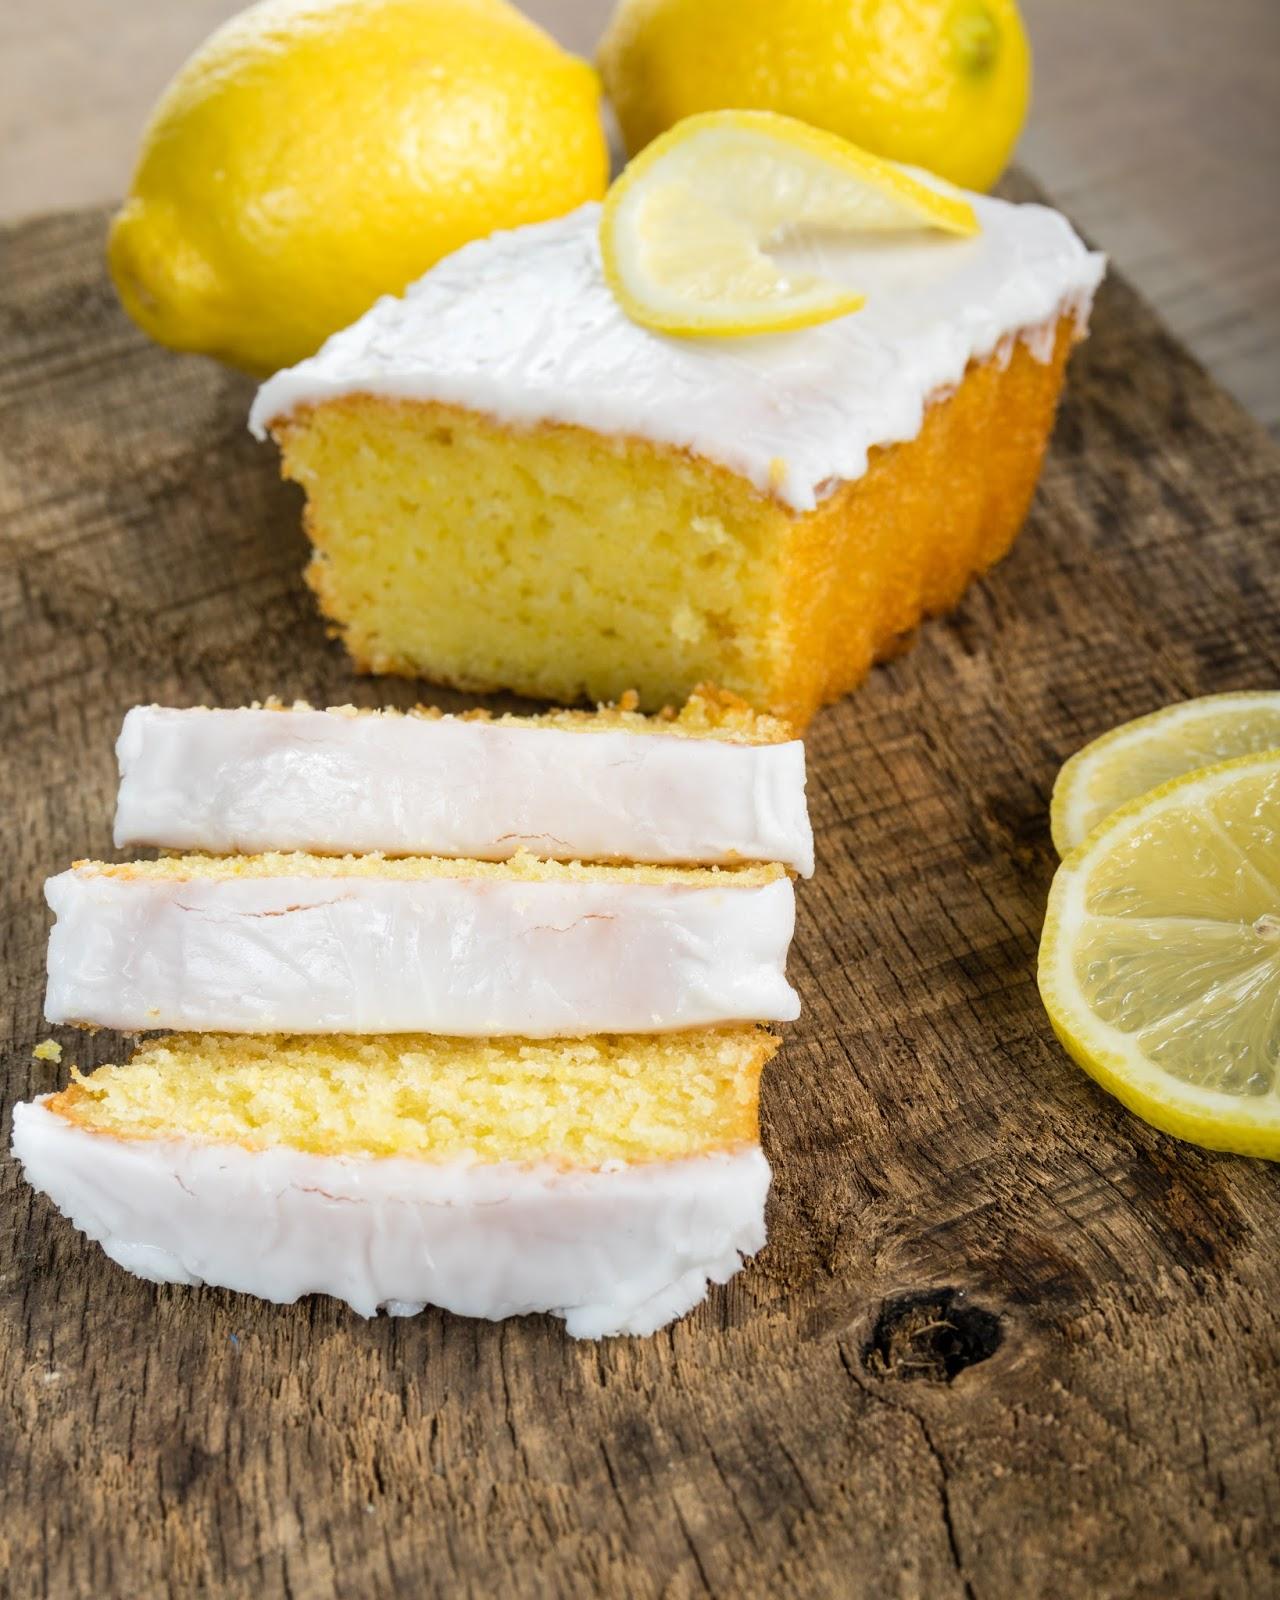 Costco Lemon Drizzle Cake Calories